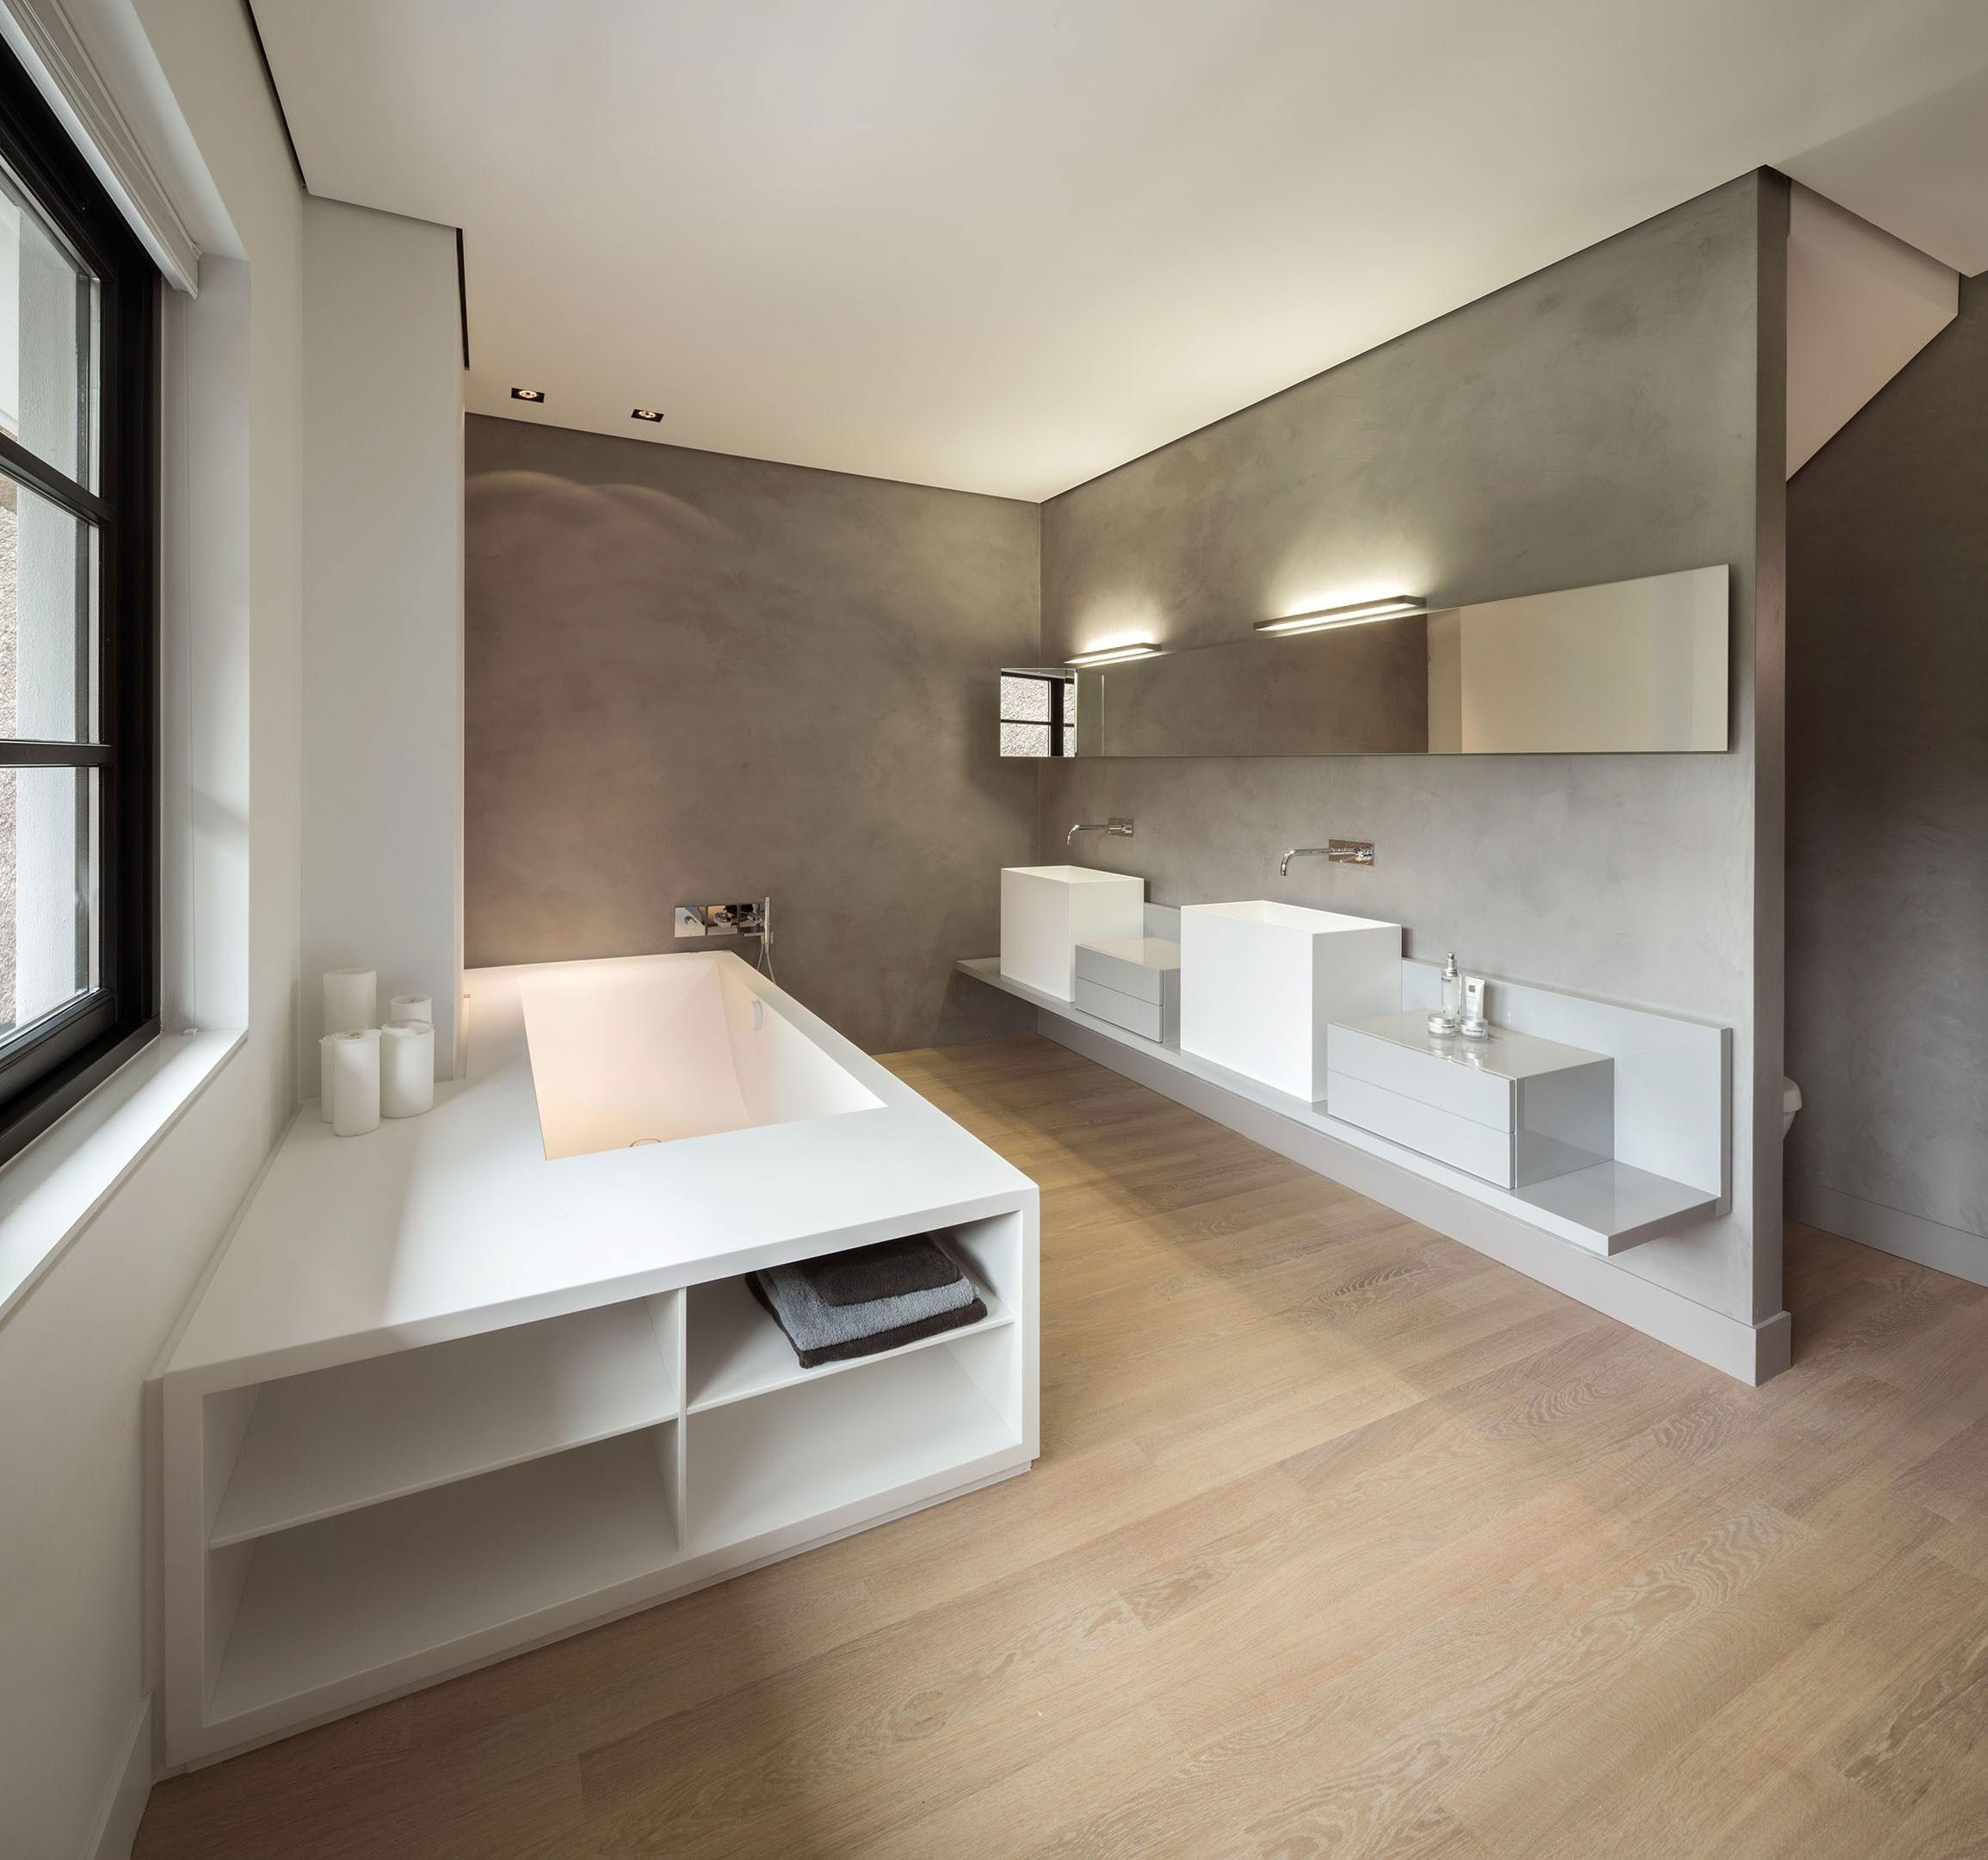 Modern Huizen Country House Located in a Quiet Rural Setting by De Brouwer Binnenwerk-20